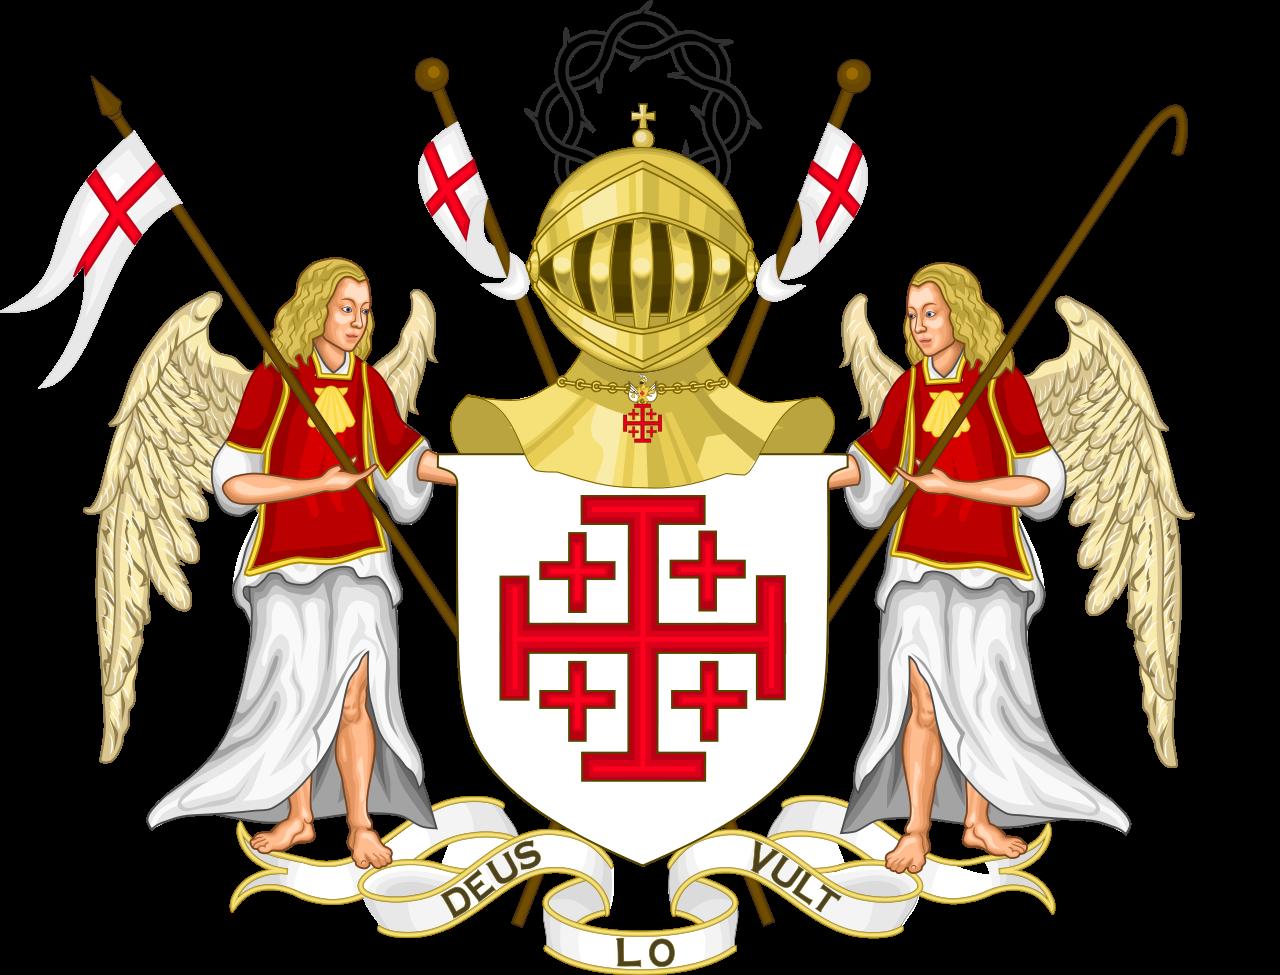 Eohsj northwestern lieutenancy order. Knights clipart chivalry